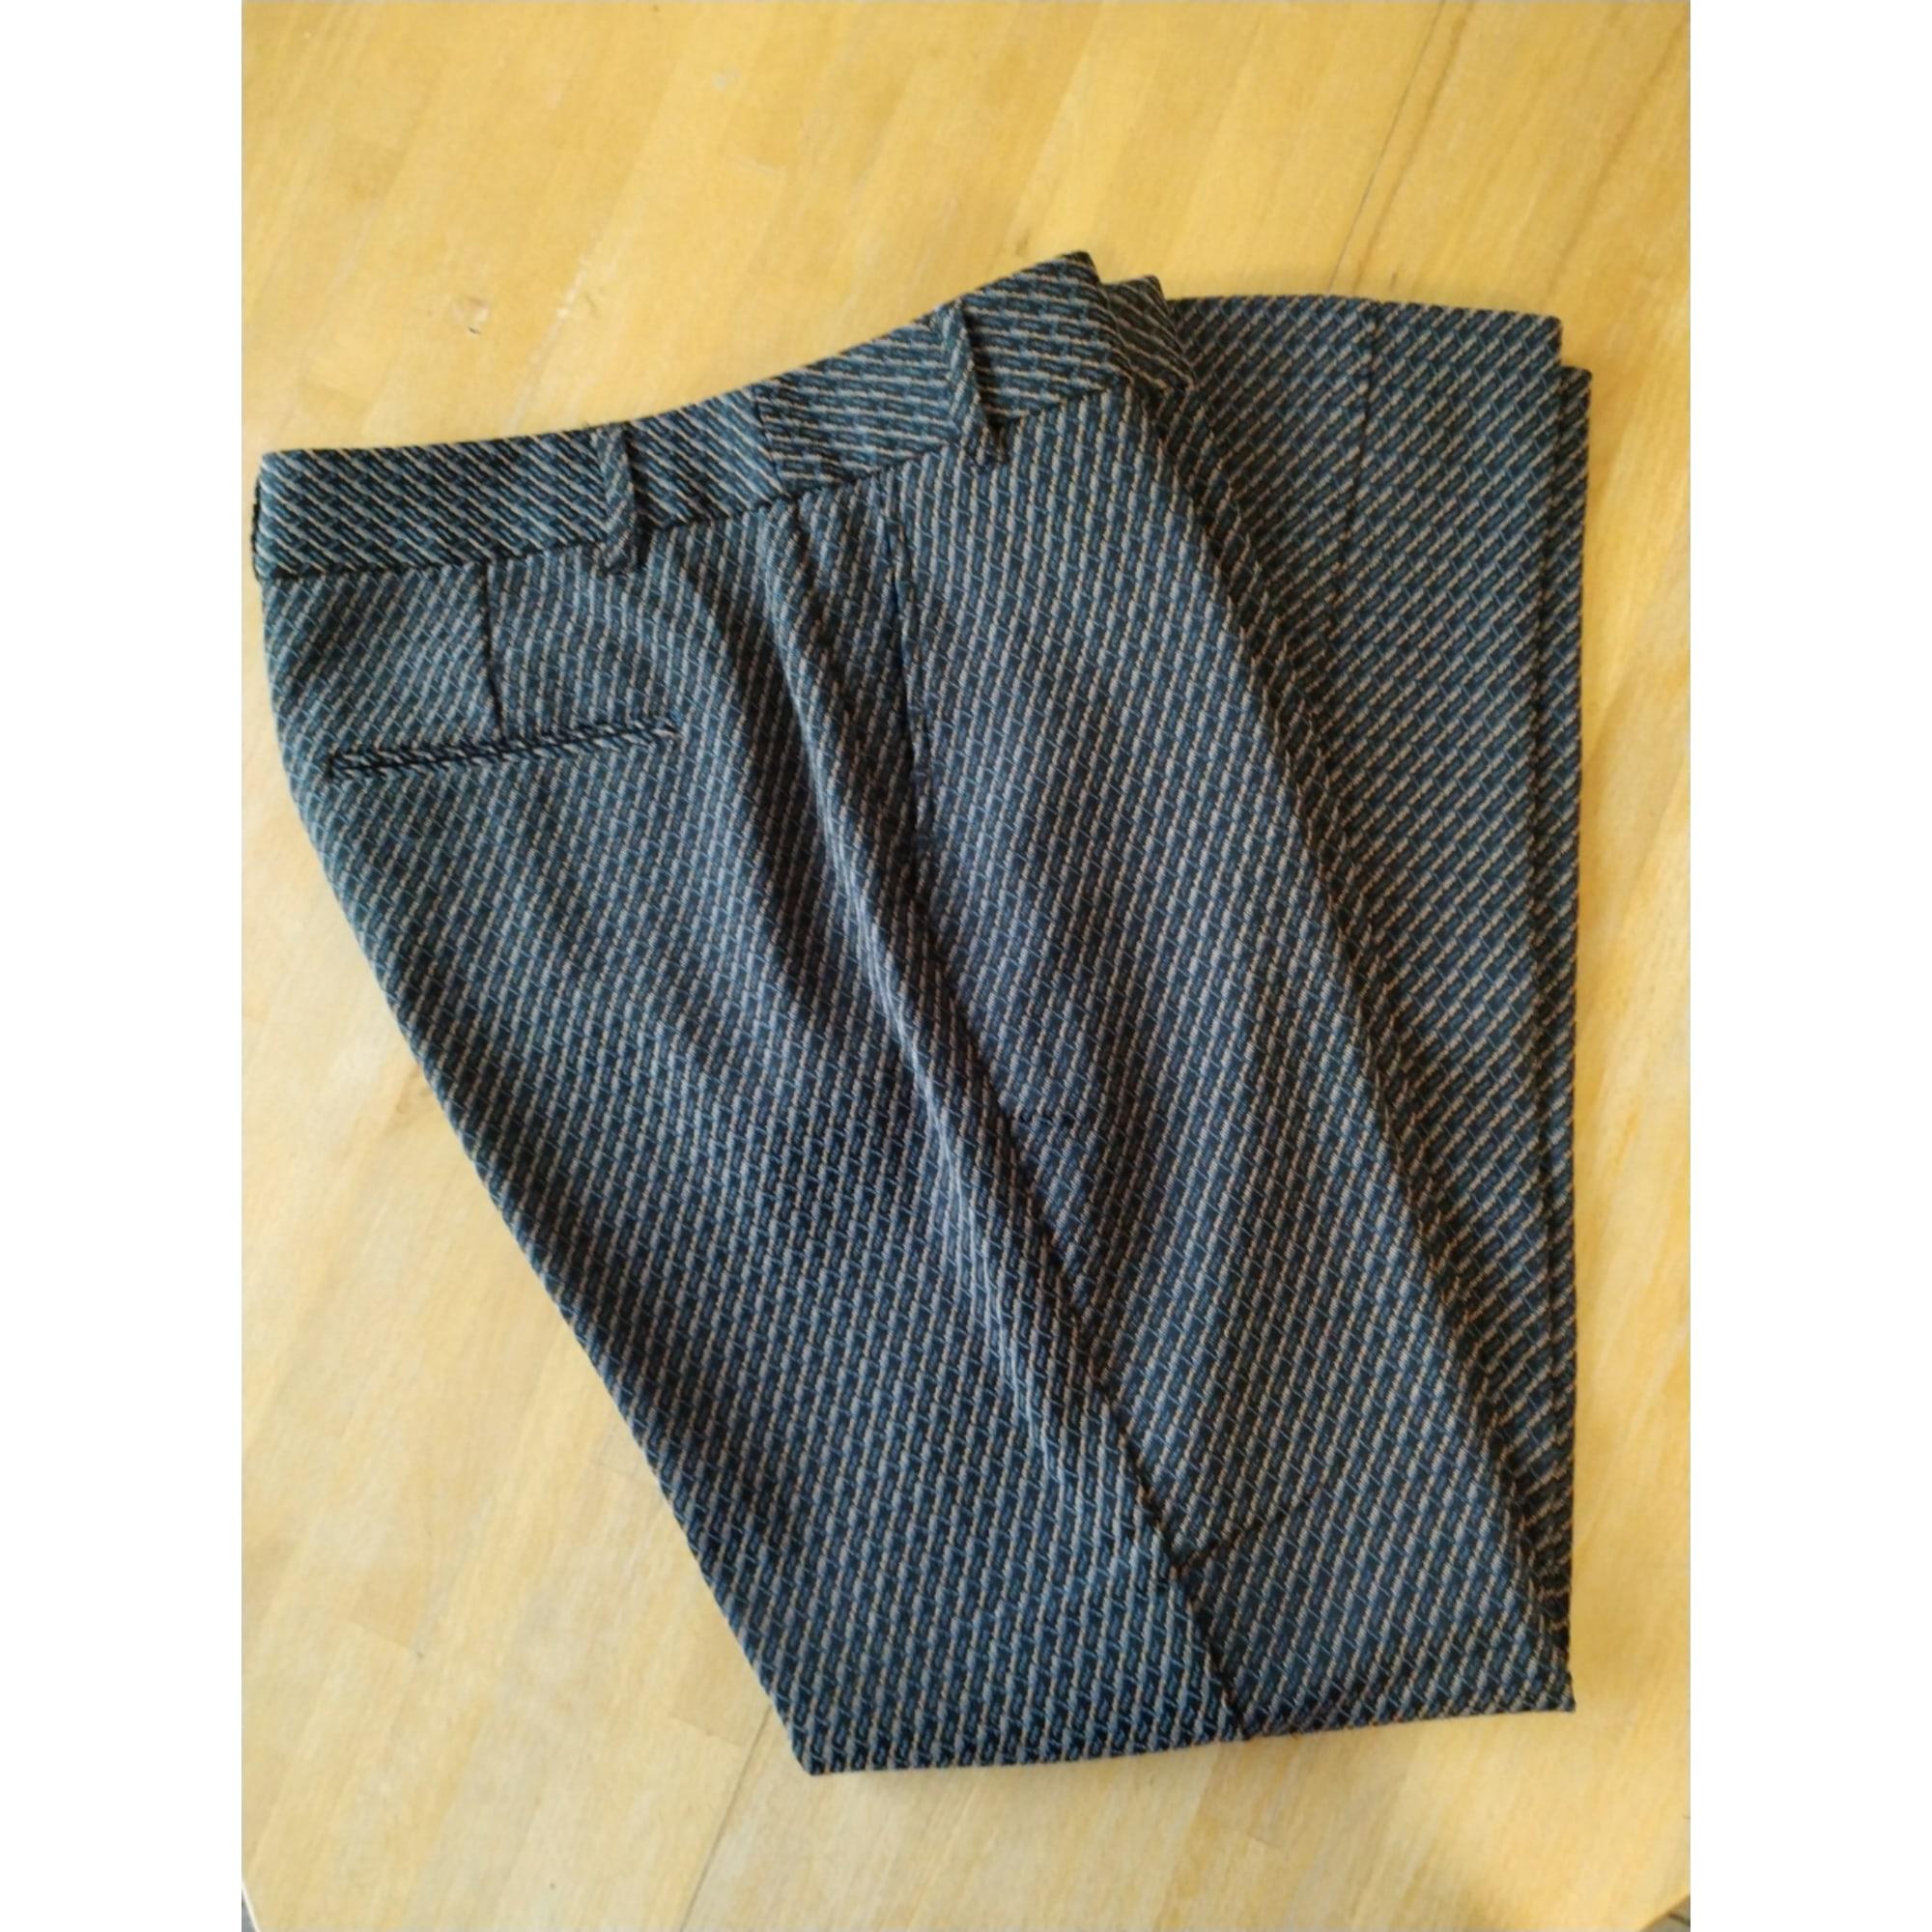 Pantalon droit MKT bleu gris jaune